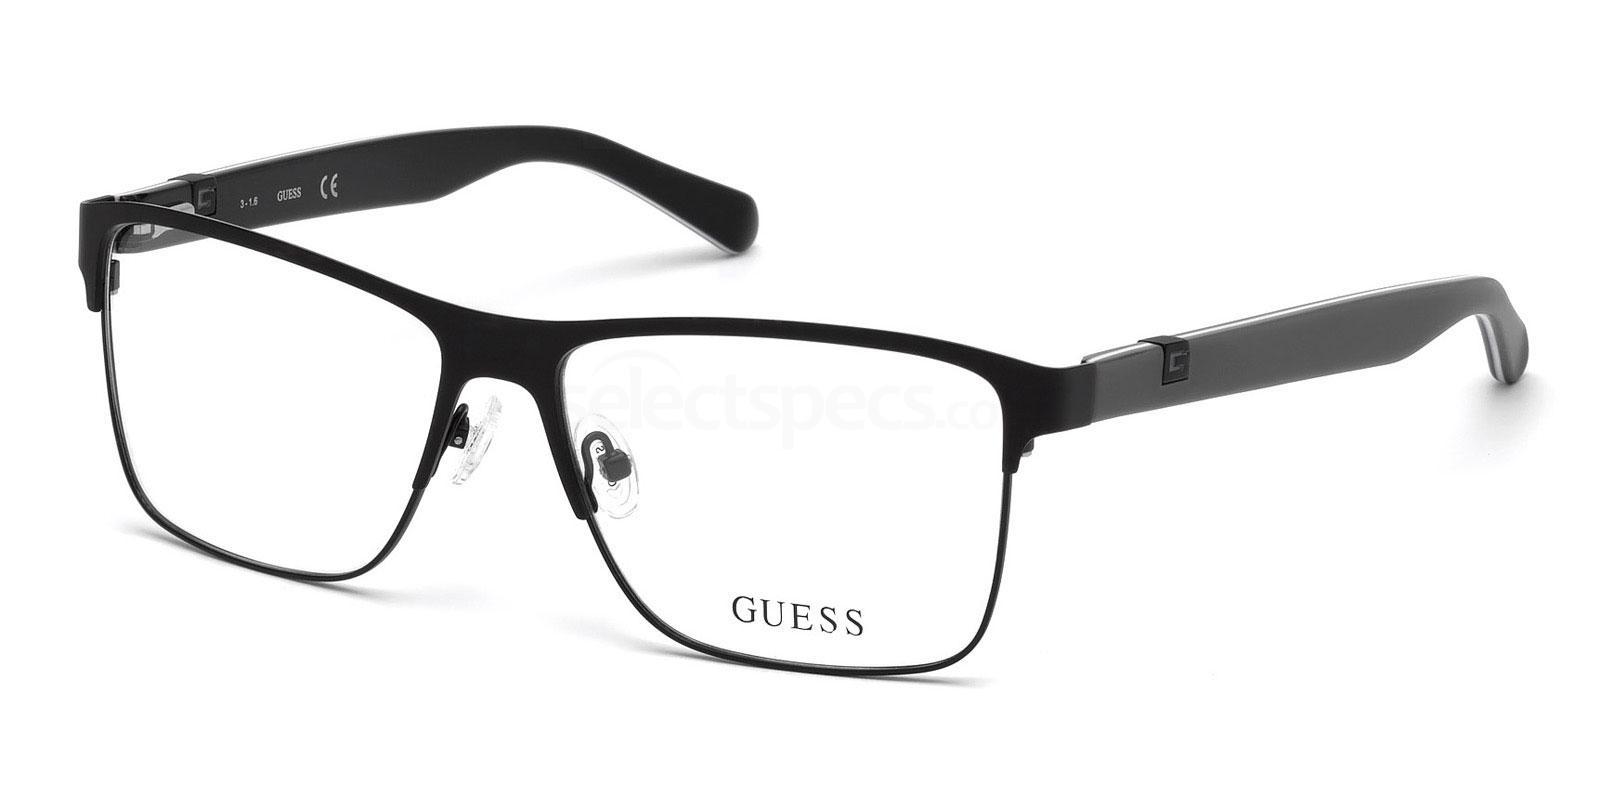 002 GU1912 Glasses, Guess